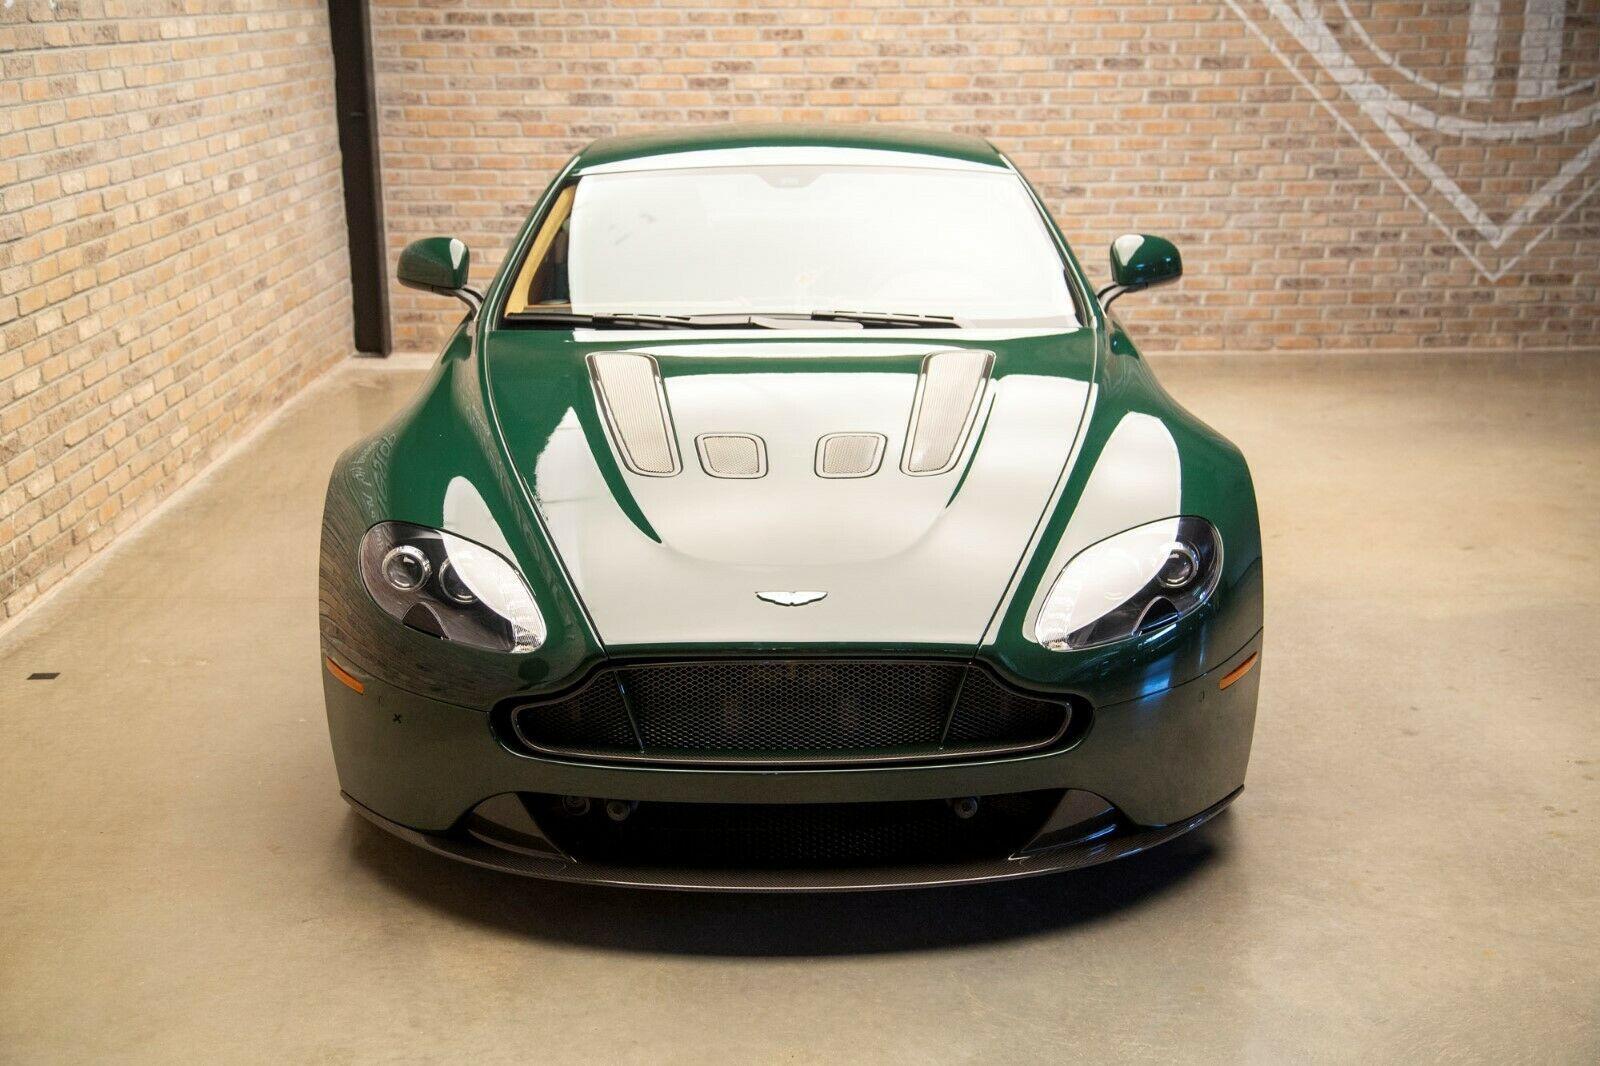 Manual 2017 Aston Martin V12 Vantage S For Sale